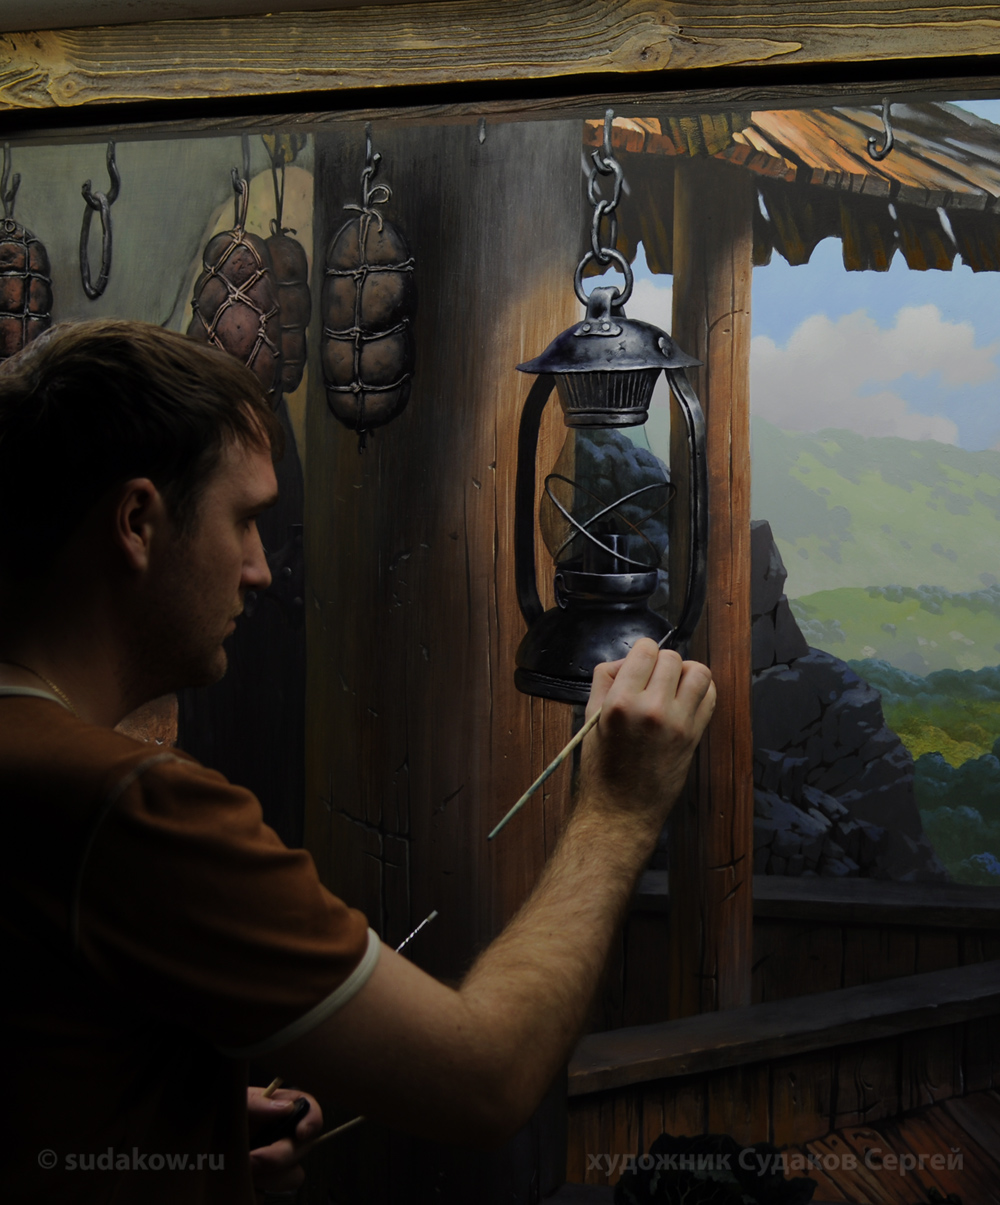 Сайт сергея судакова по росписи стен